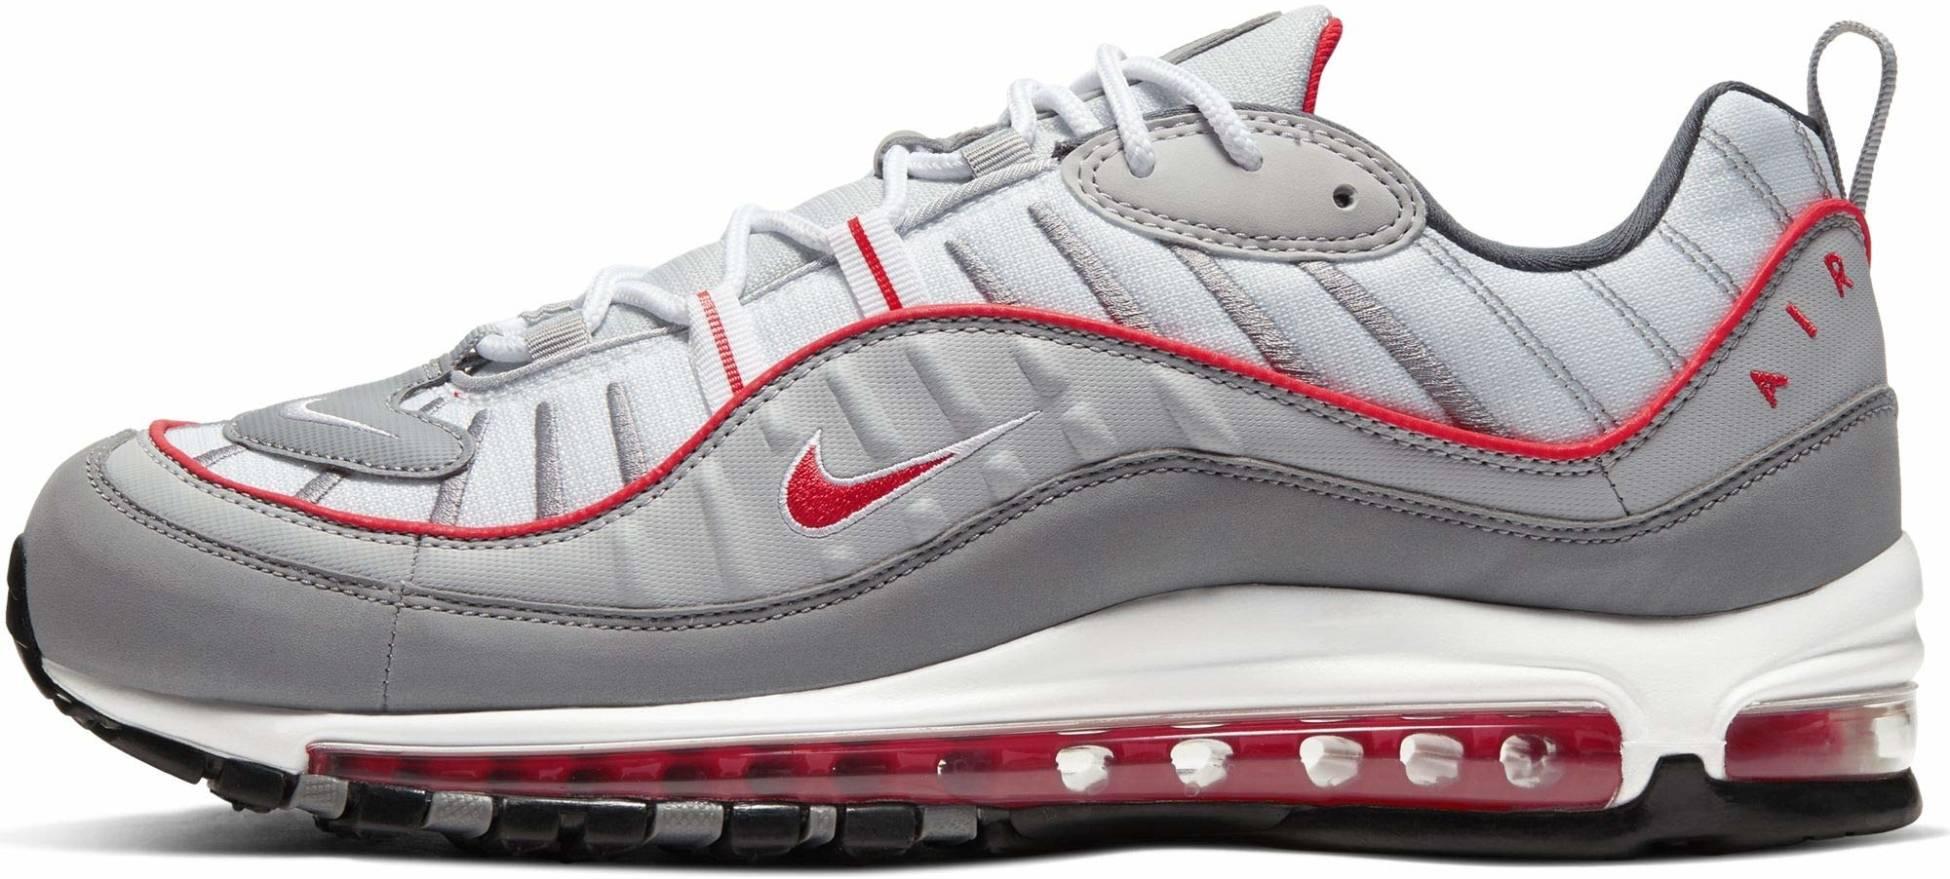 Save 46% on Grey Nike Sneakers (200 Models in Stock) | RunRepeat